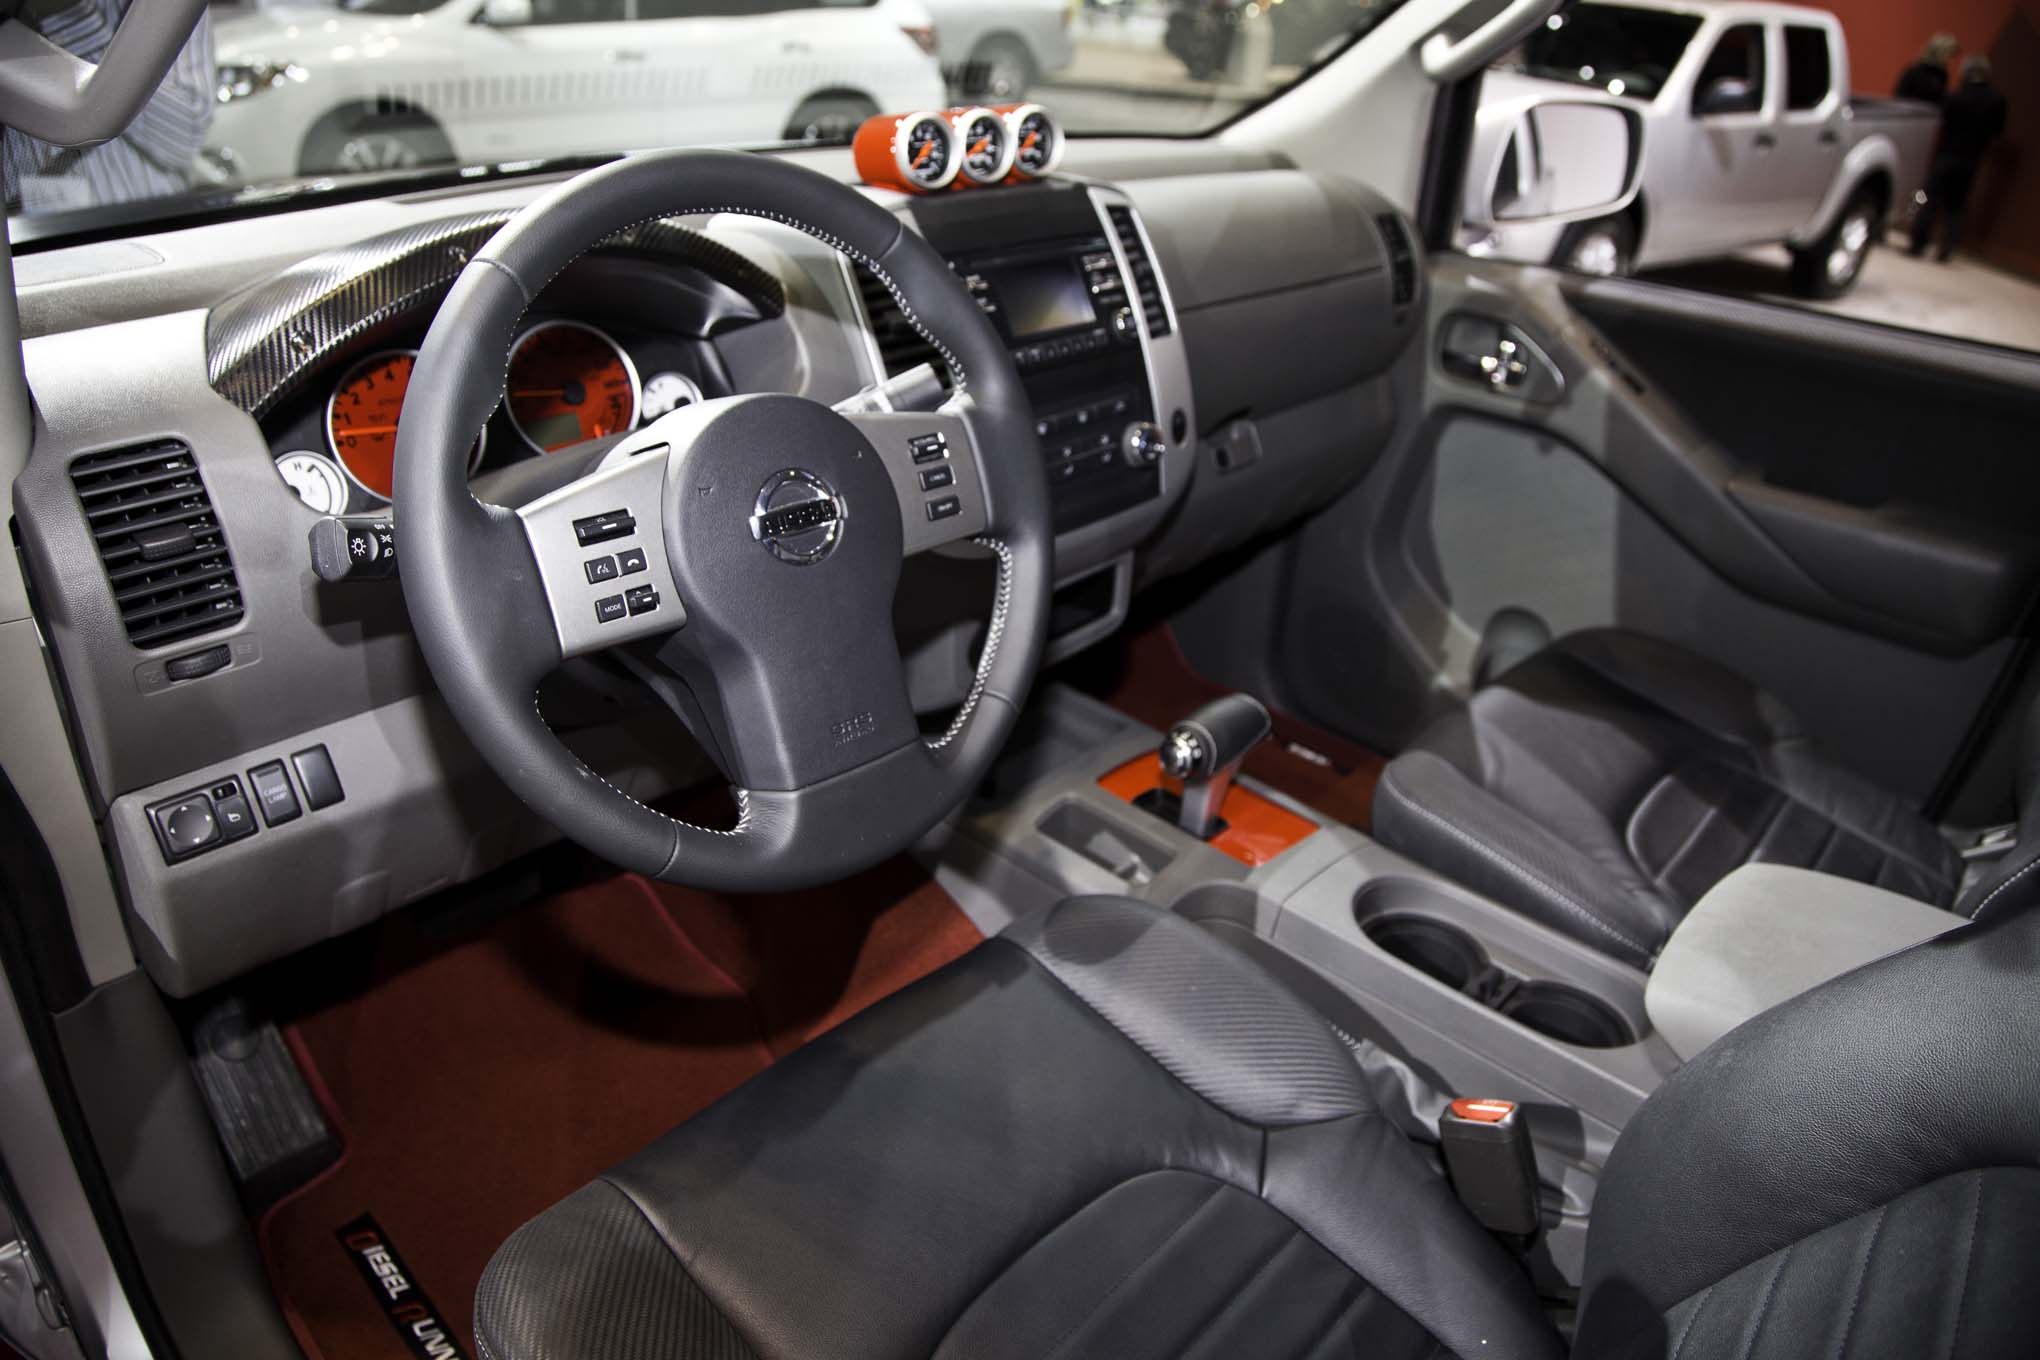 Nissan Frontier Diesel Runner Concept Shown at 2014 Chicago Auto